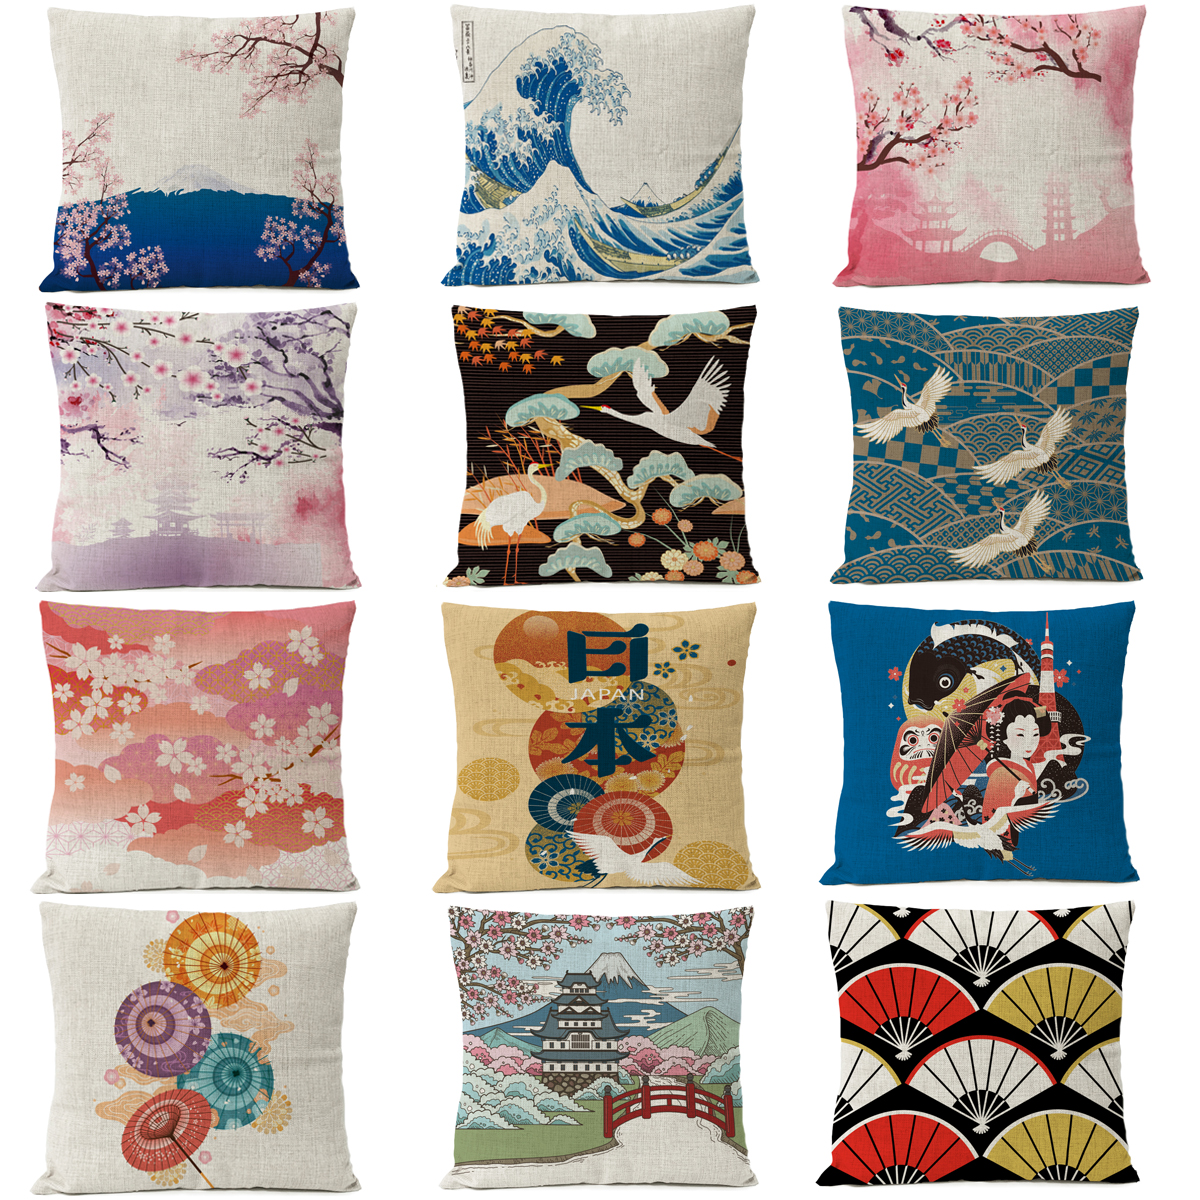 Japanese Ukiyo-e Pillow Cover Fuji Mountain Cherry Blossom Wave Cushion Cover Home Decorative Linen Pillow Case Cojines Almofada